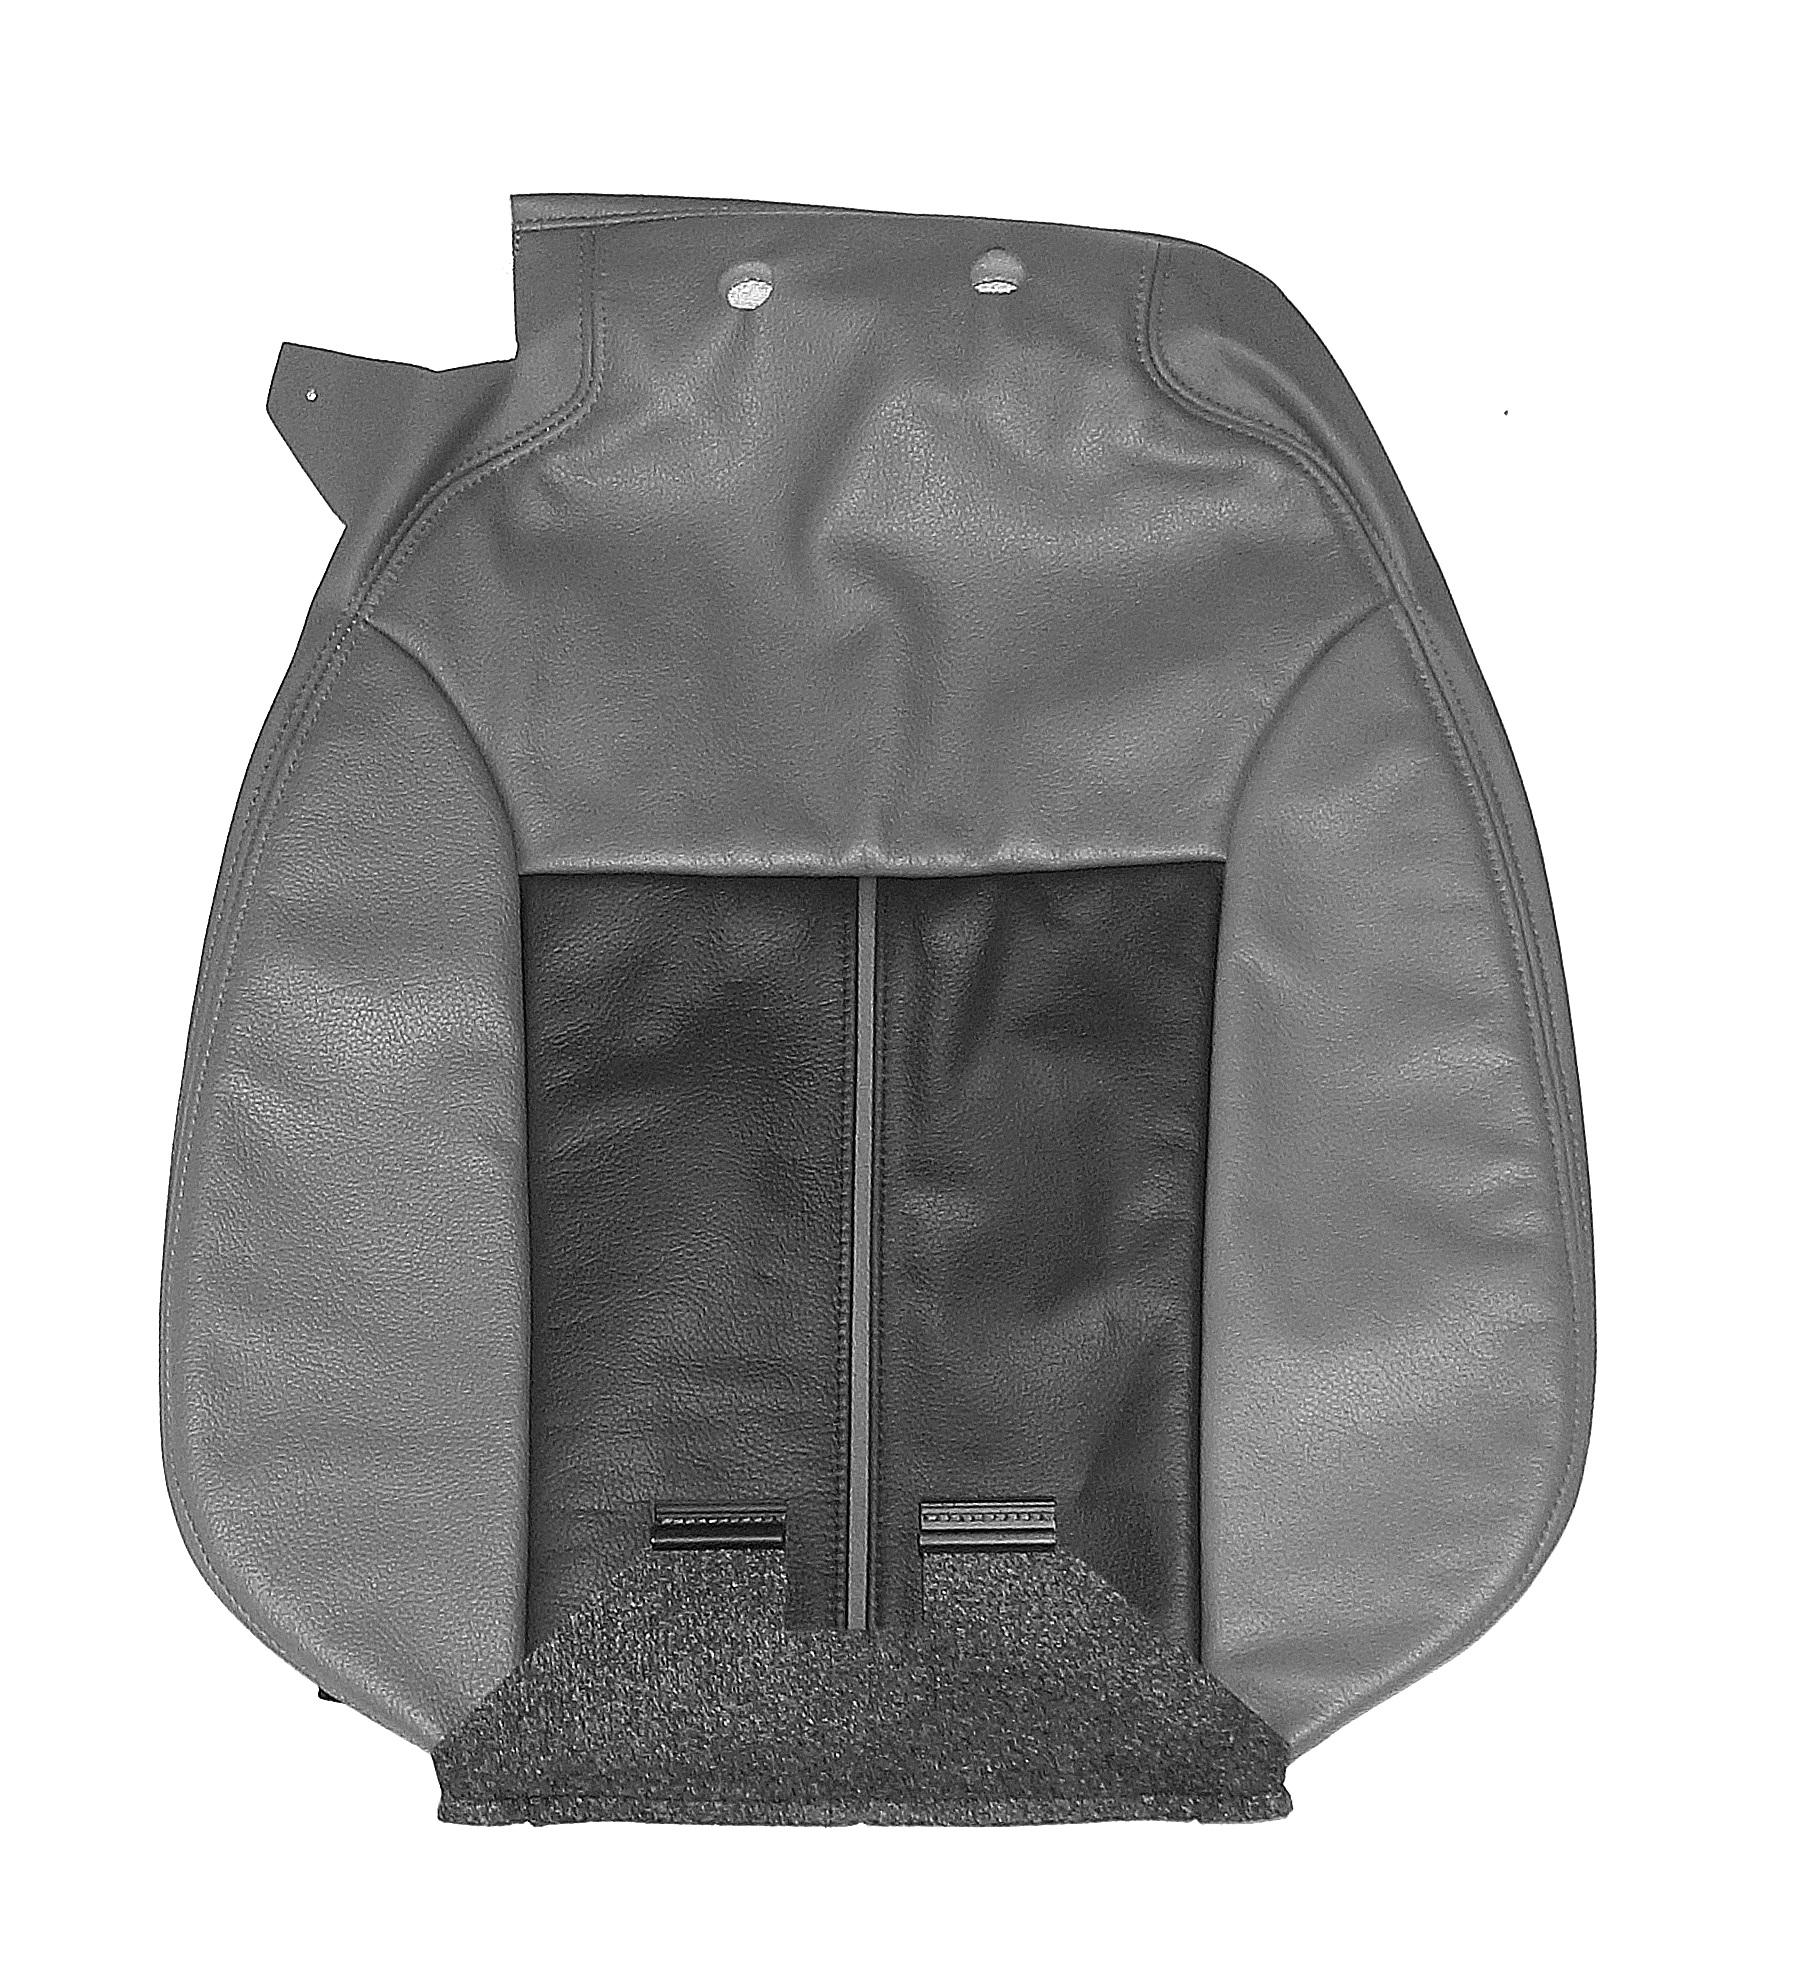 12765321 SAAB K06 Seat Cover Front Backrest RH